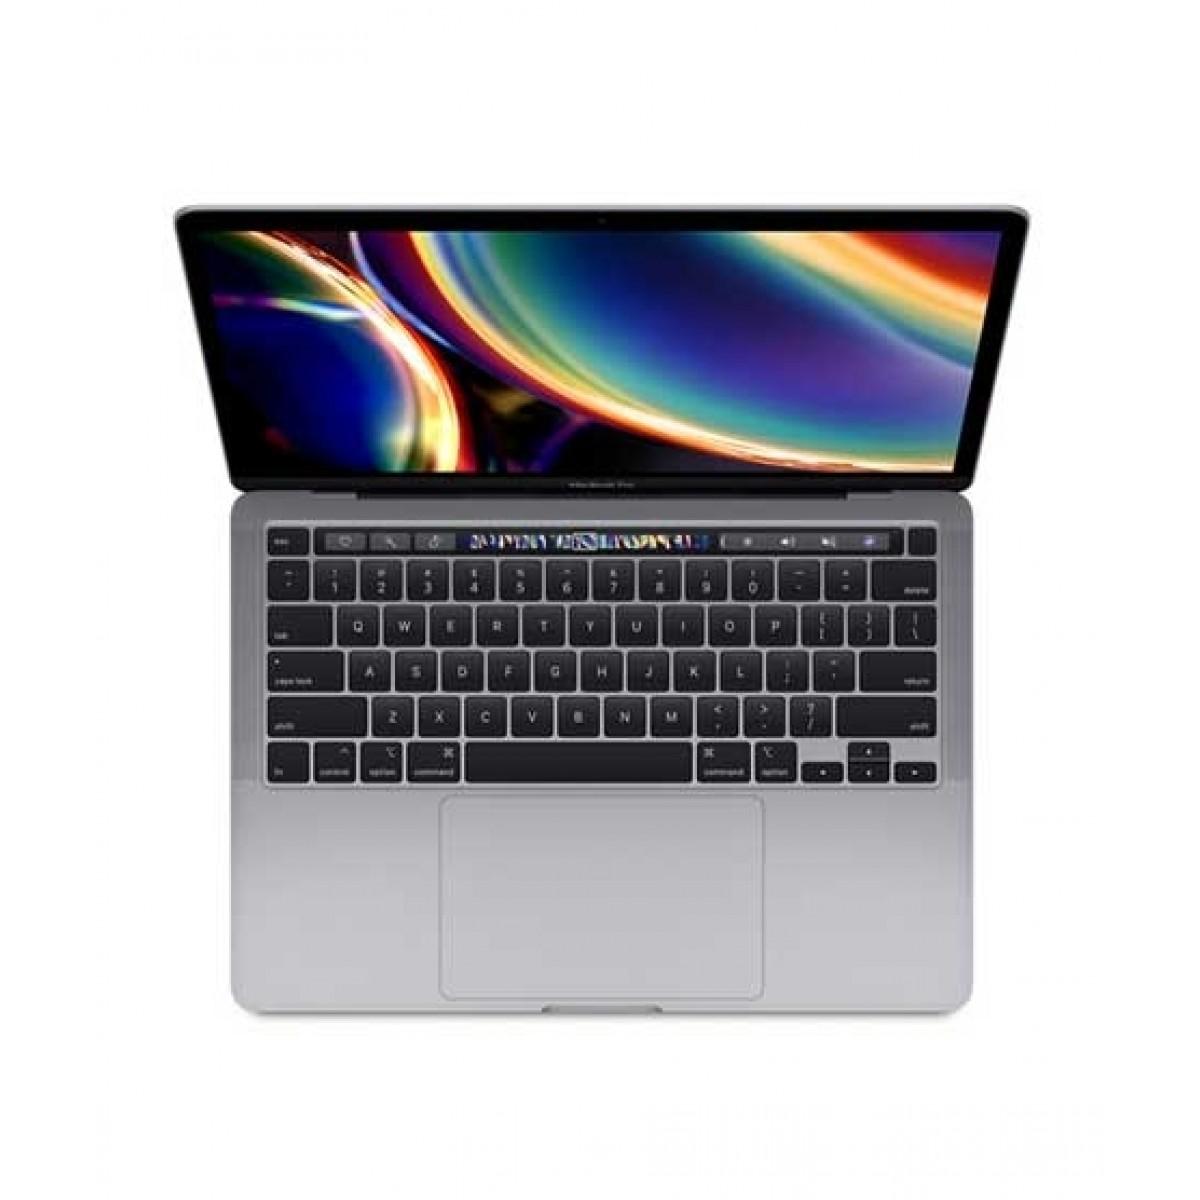 "Apple Macbook Pro 13.3"" Core i5 Space Gray (MXK52)"